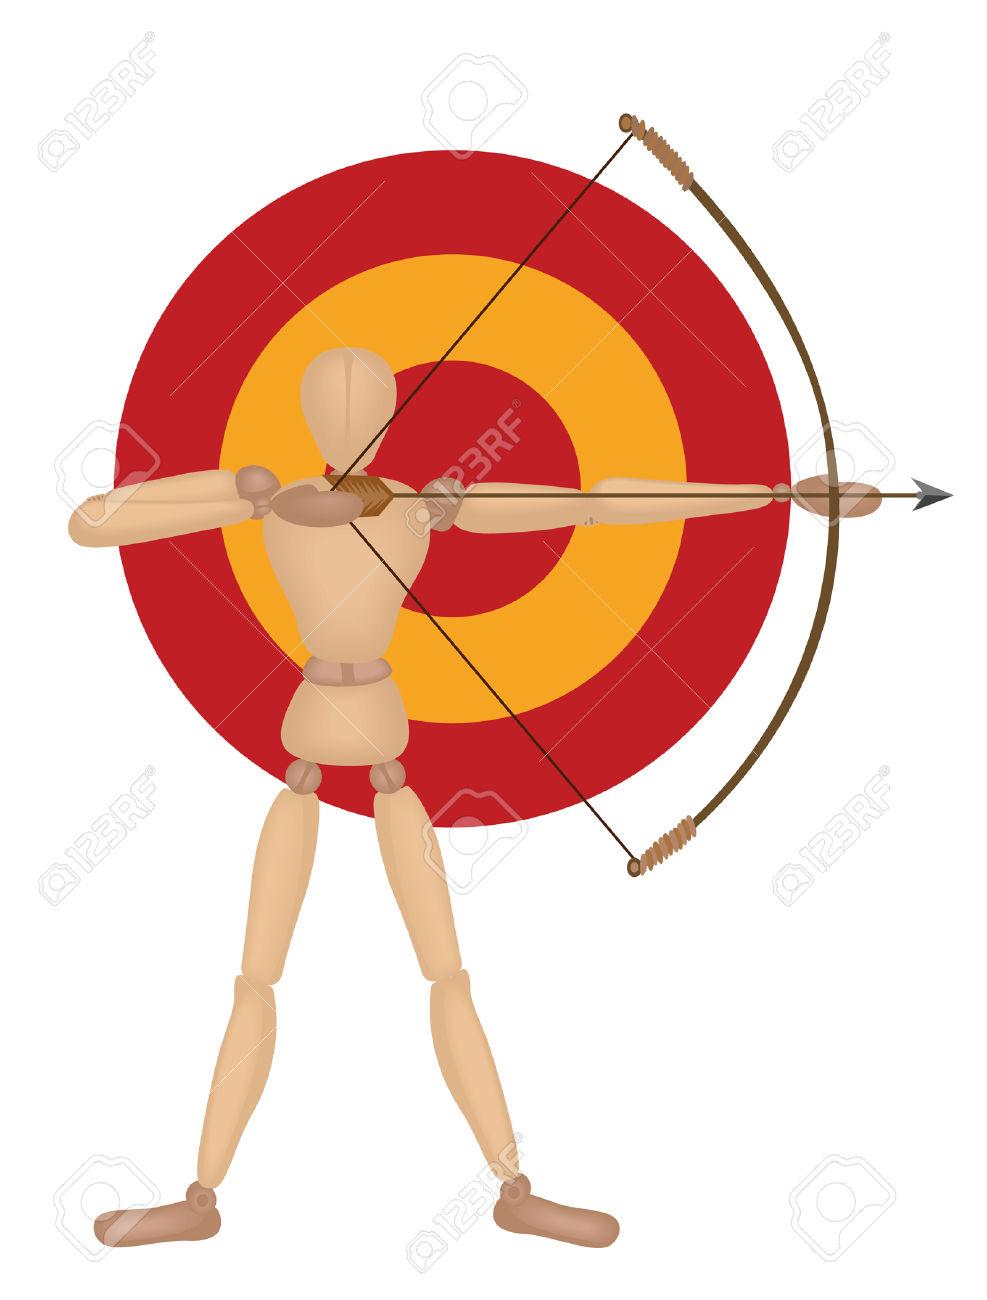 Shooting arrow clipart vector free stock Mannequin Series: Shooting Arrow Royalty Free Cliparts, Vectors ... vector free stock